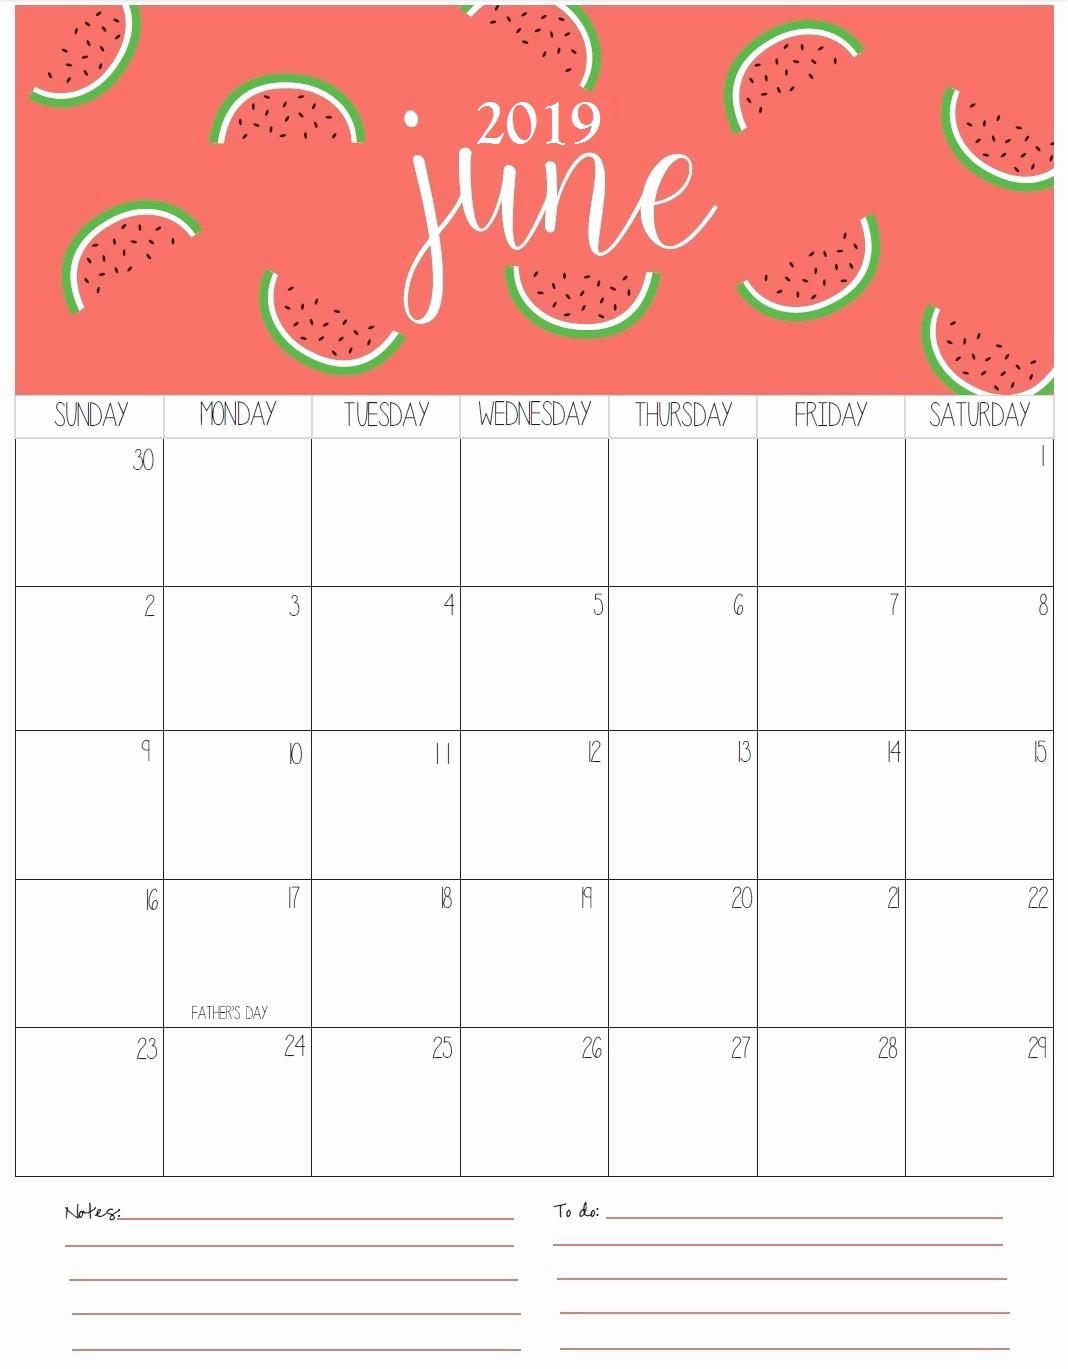 Monthly Calendar Template 2019 Elegant Monthly Printable Calendar 2019